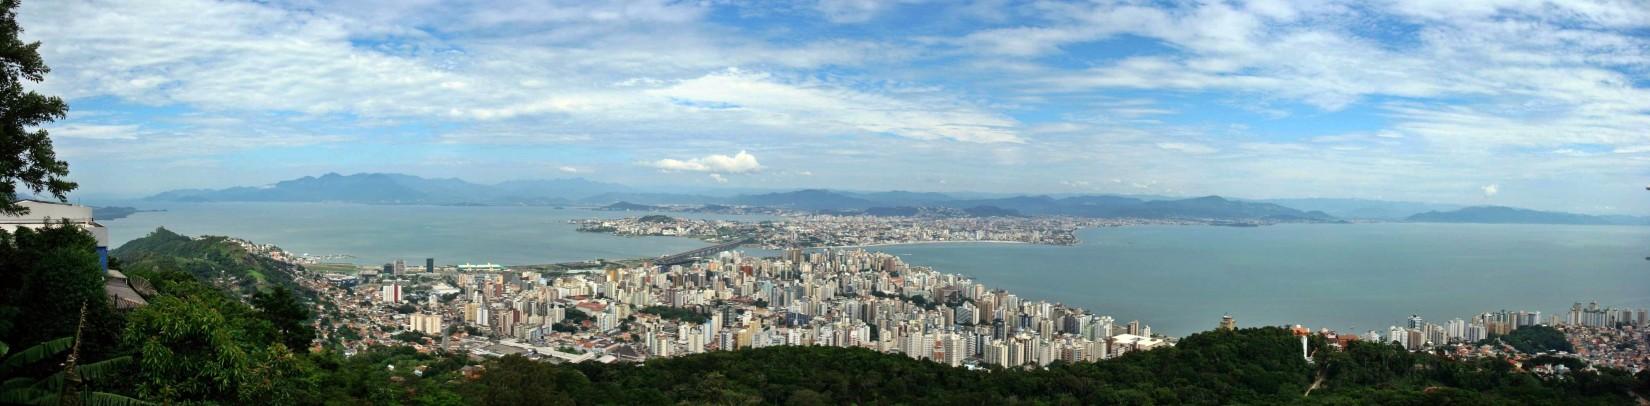 Panorama Florianópolis (CC BY-SA by Runge-36)